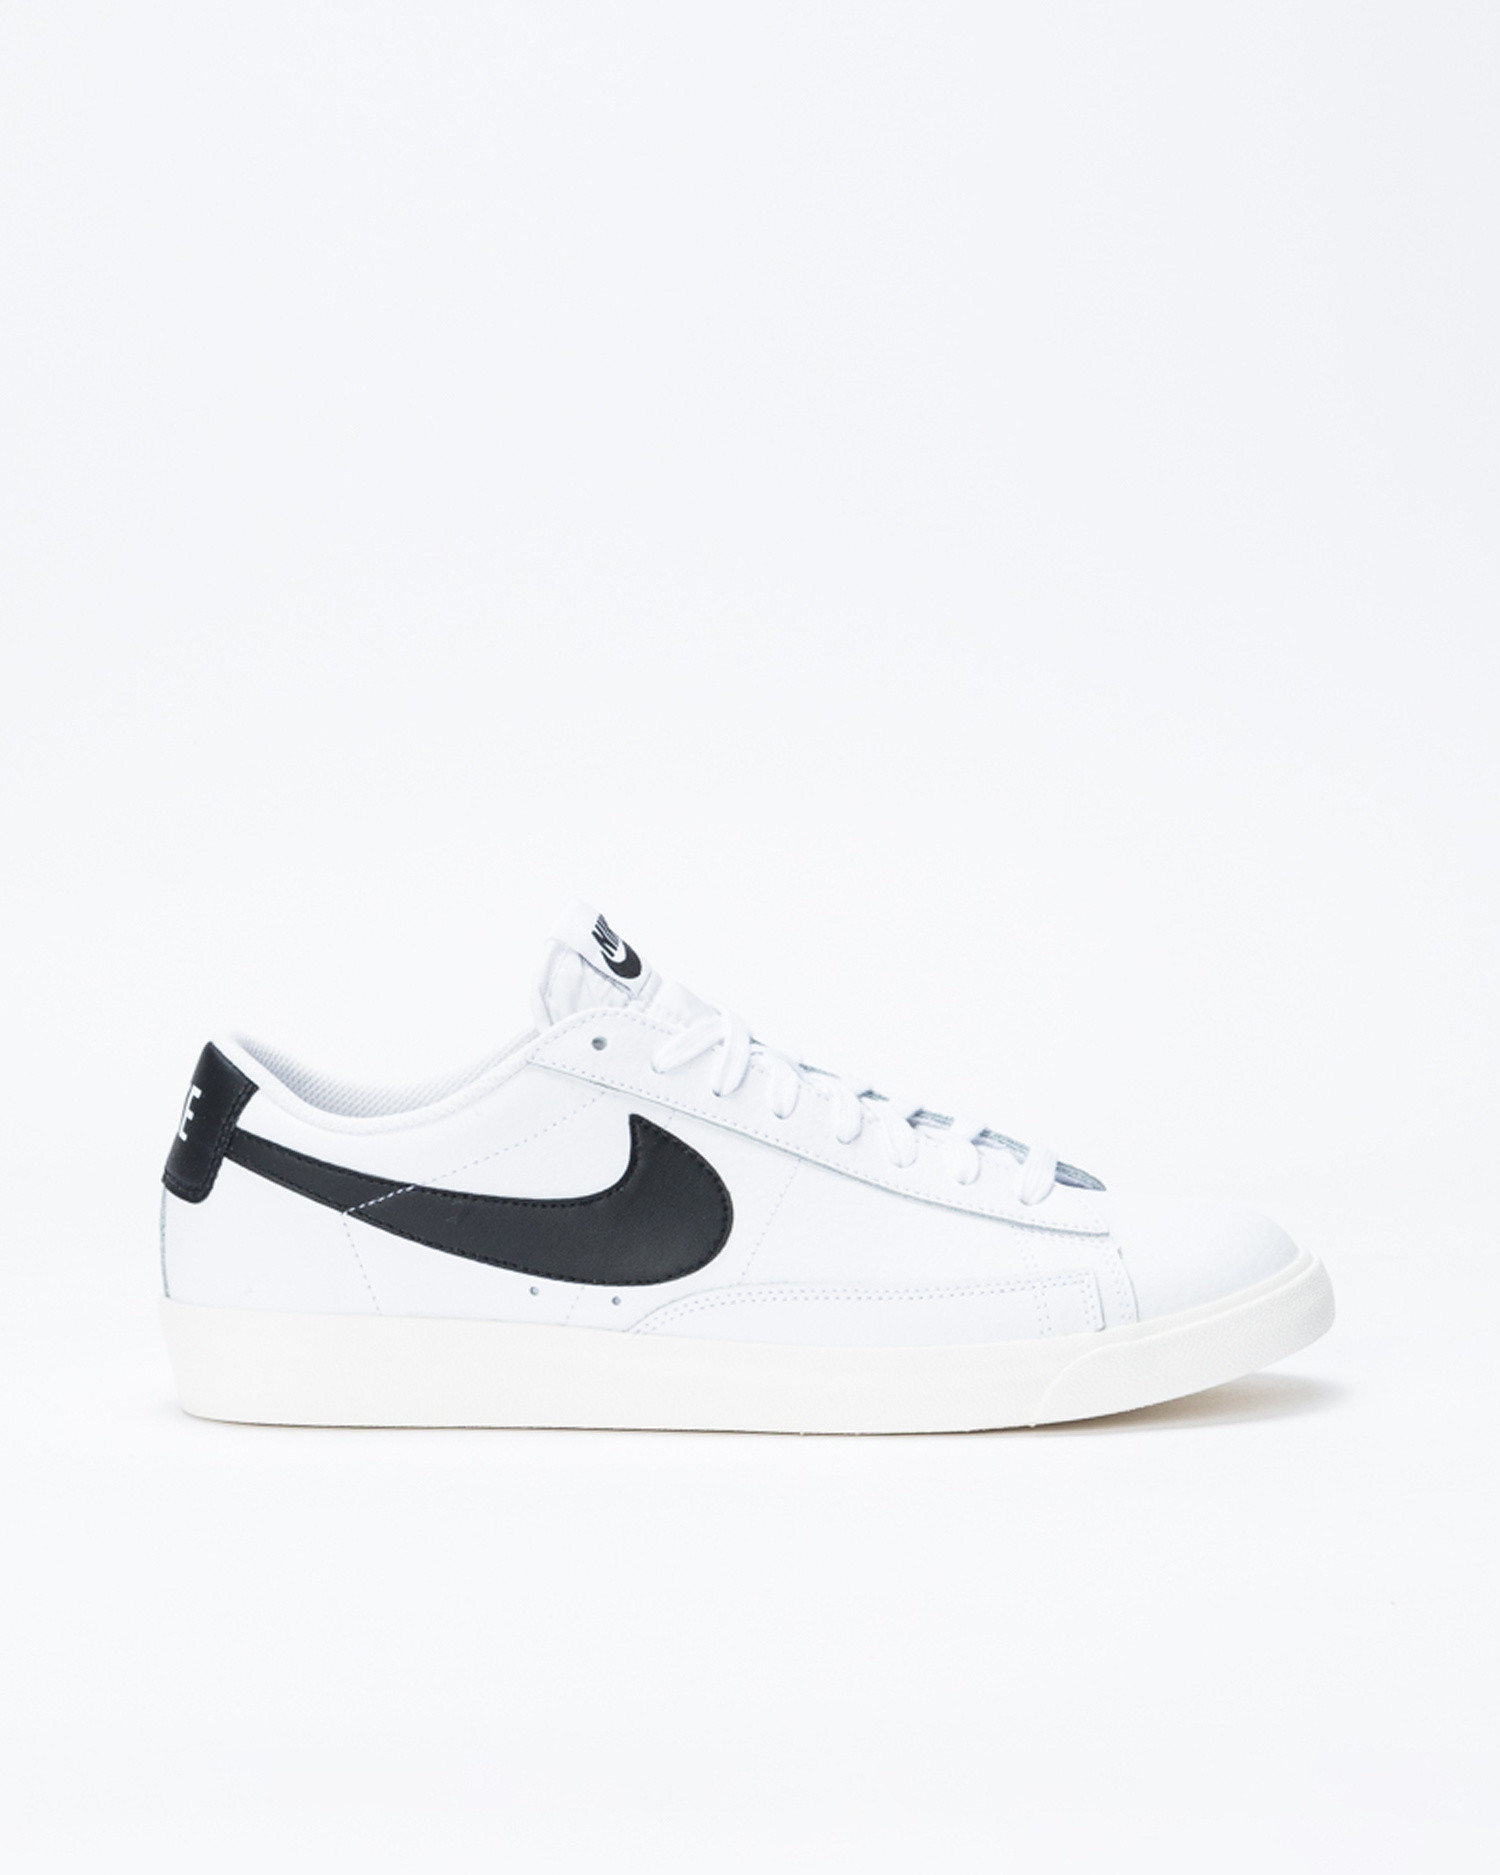 Nike Blazer Low Leather White/Black-Sail